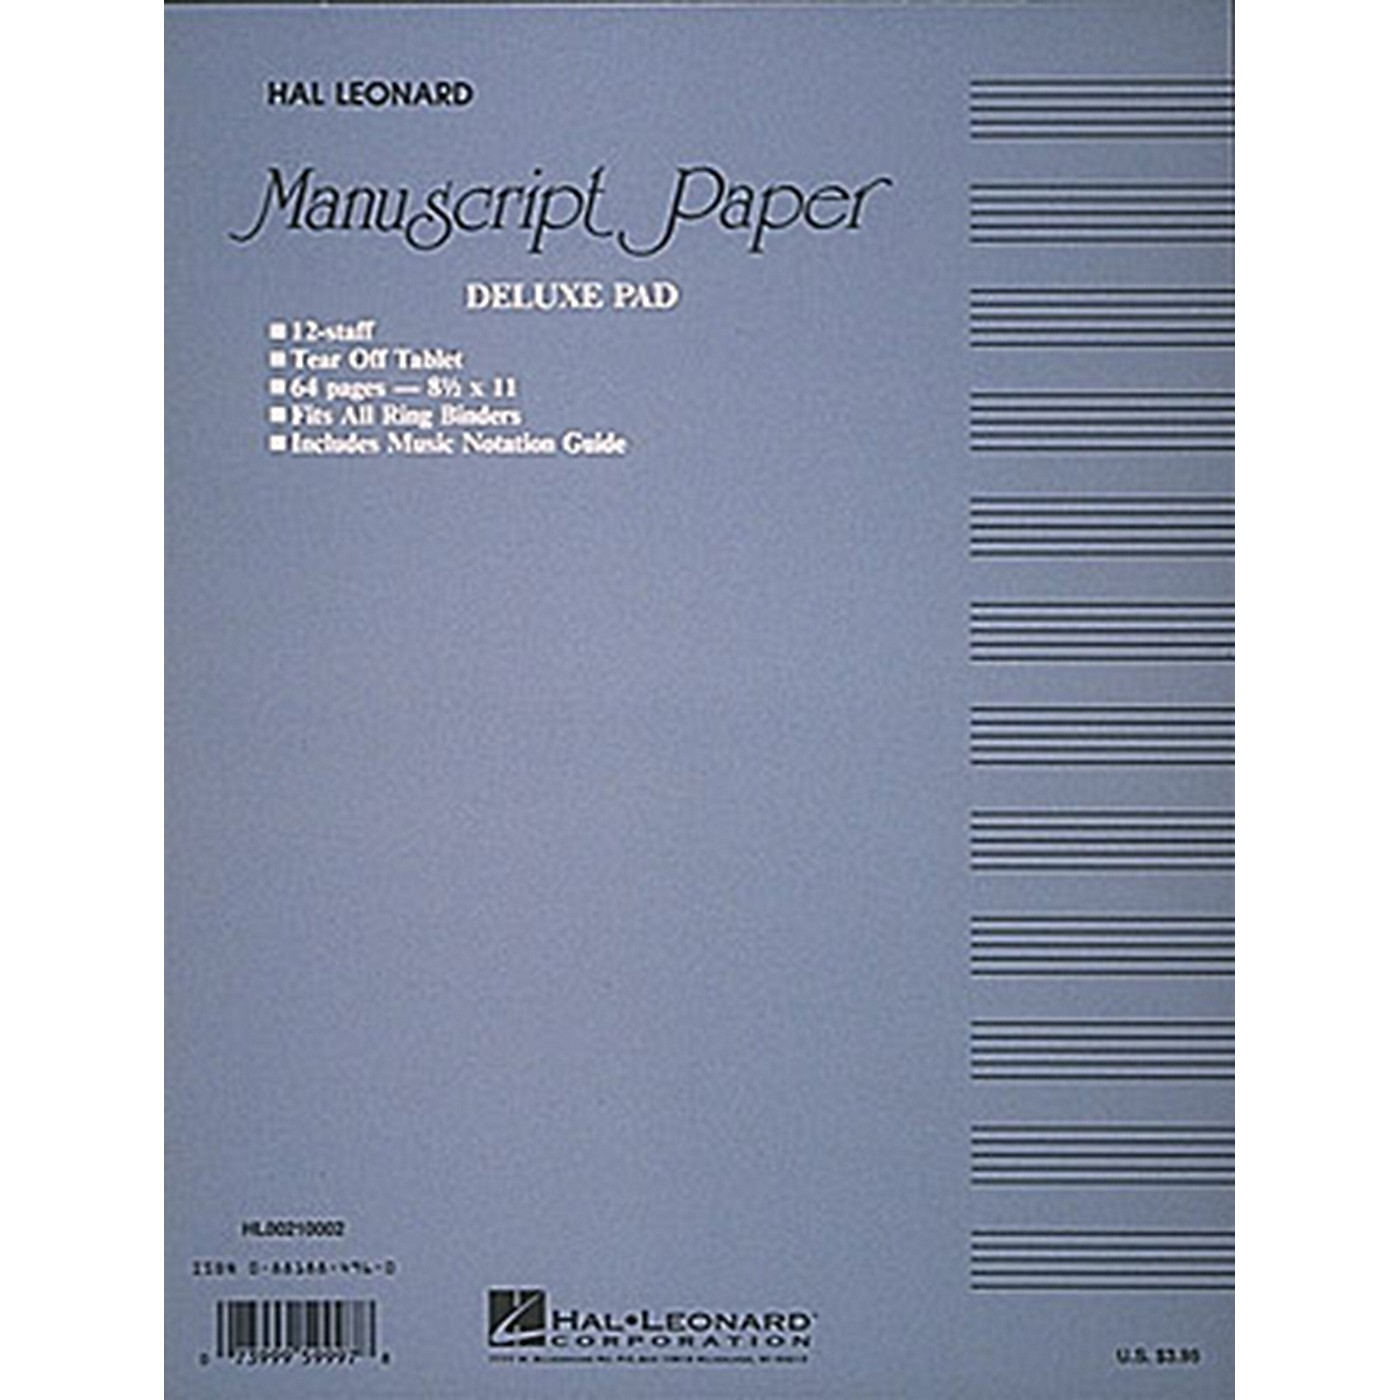 Hal Leonard Manuscript Paper thumbnail